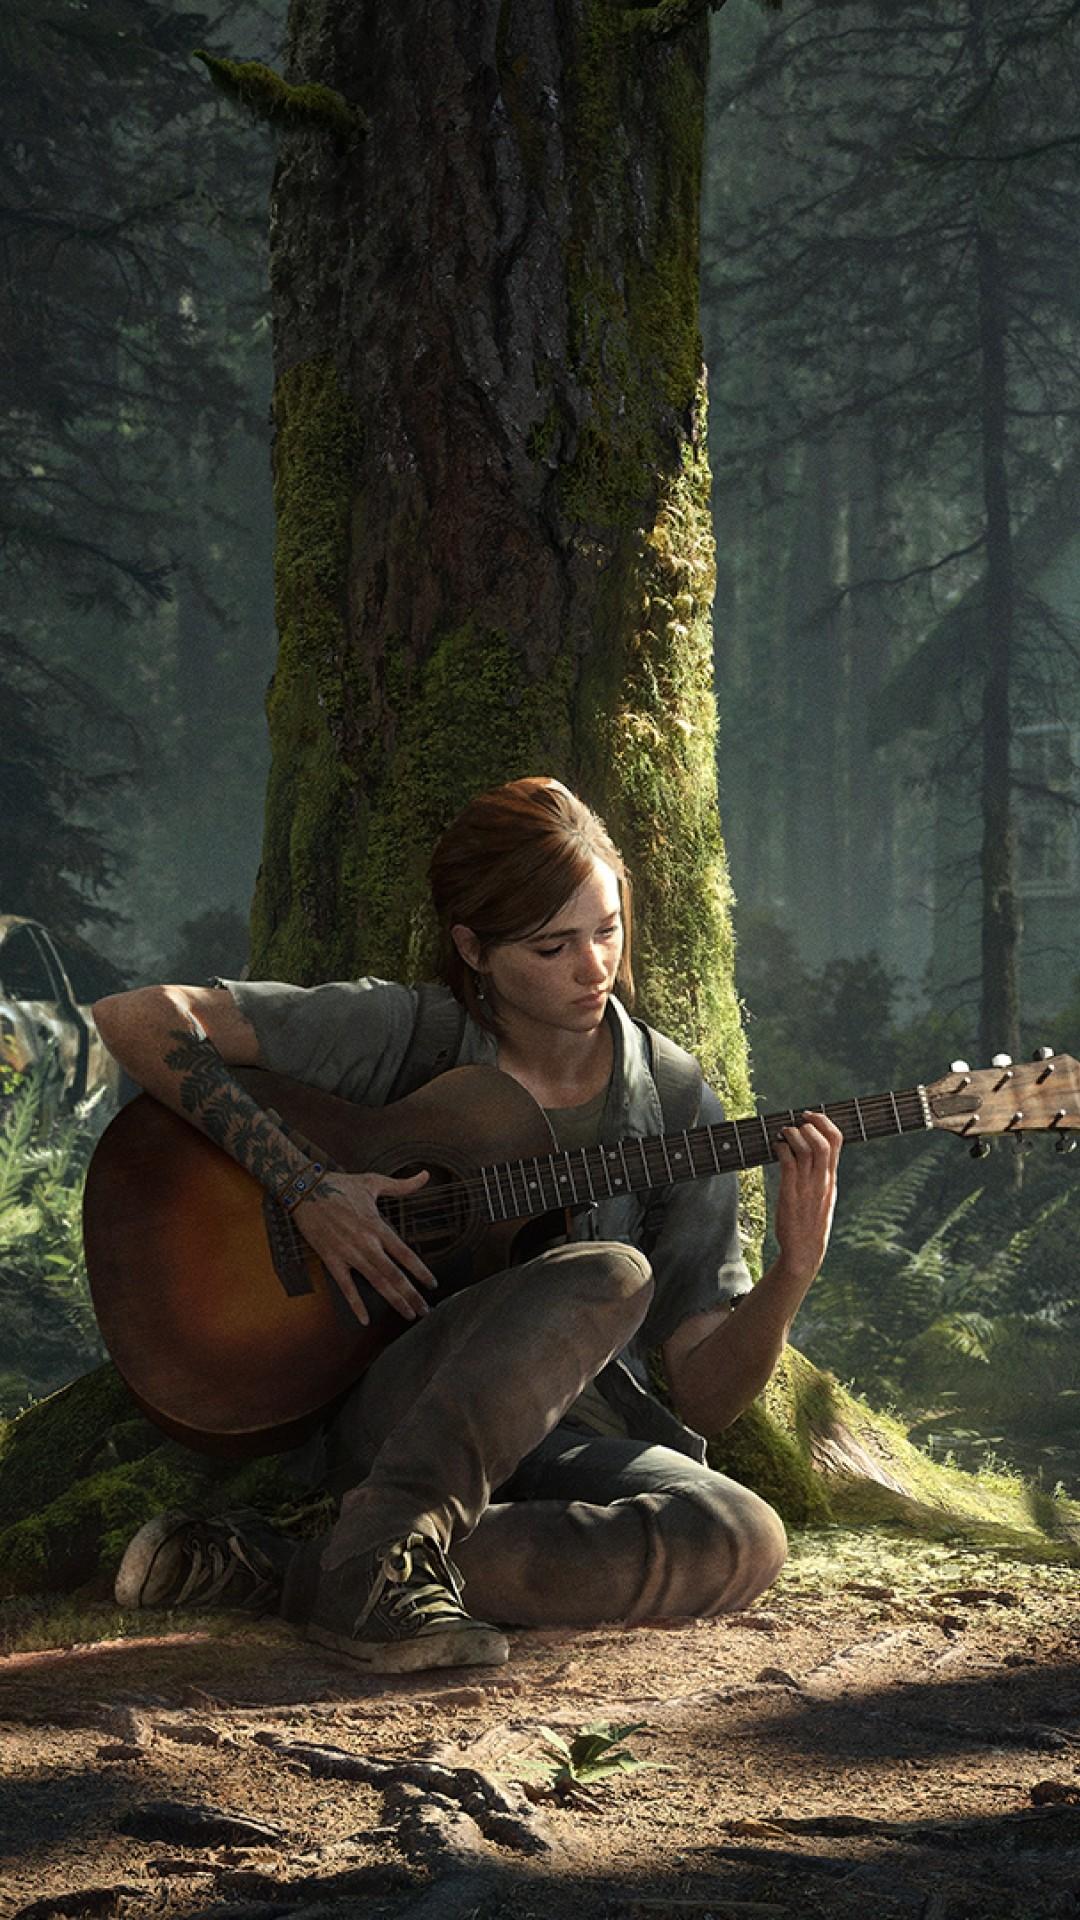 The Last Of Us iphone 6s plus wallpaper